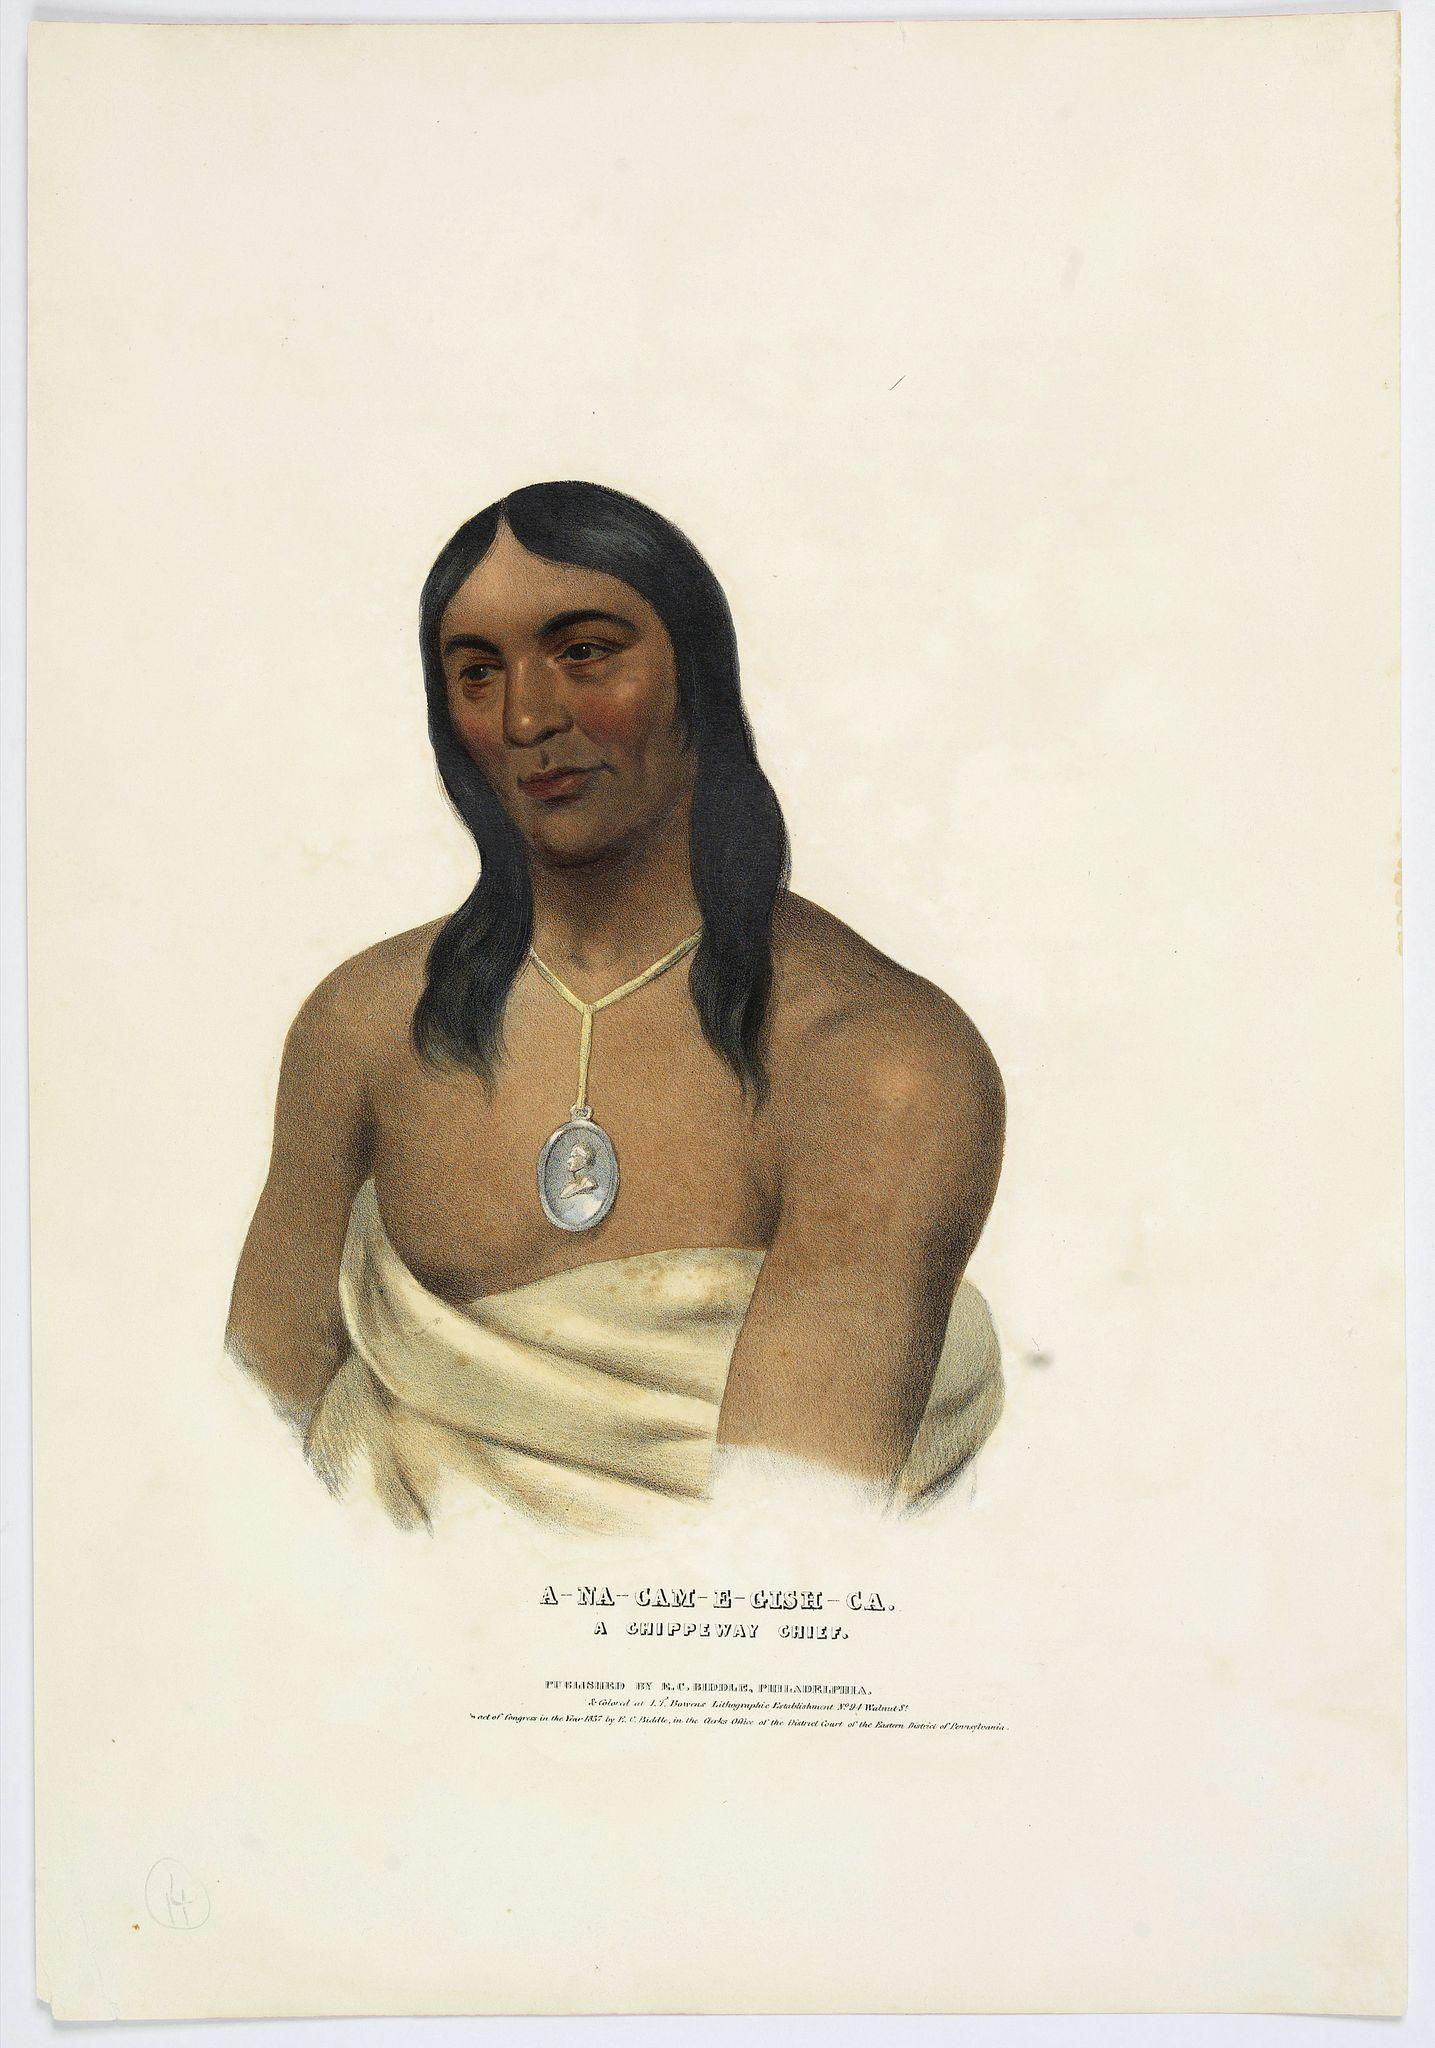 MCKENNEY, T & HALL, J. -  A-Na-Cam-E-Gish-Ca. A Chippeway Chief.